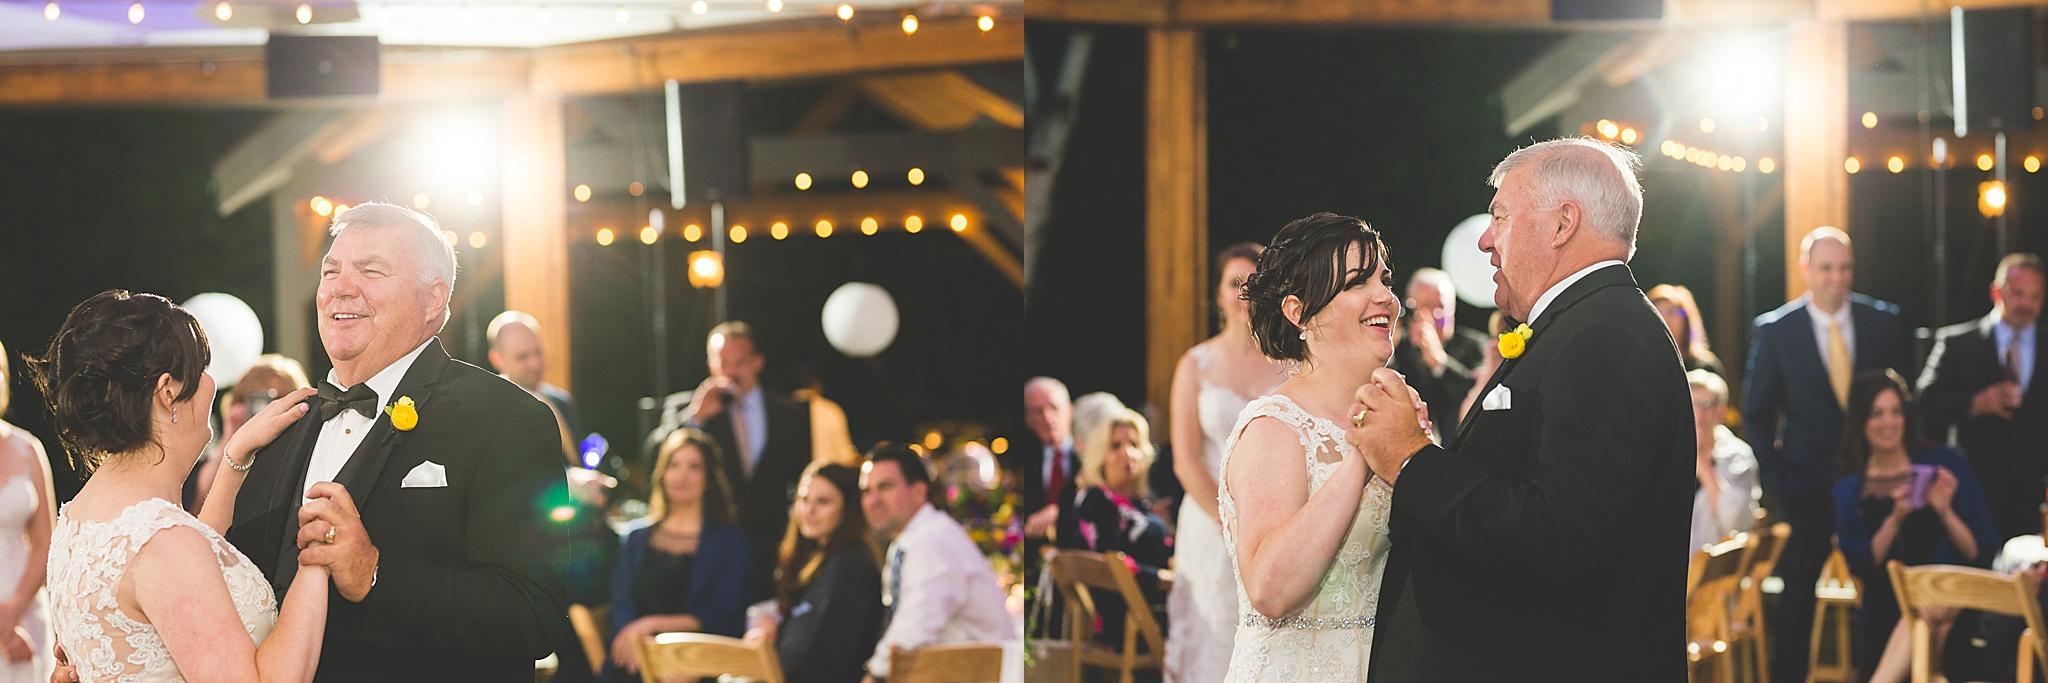 Albany_Wedding_Photographer_7391.jpg